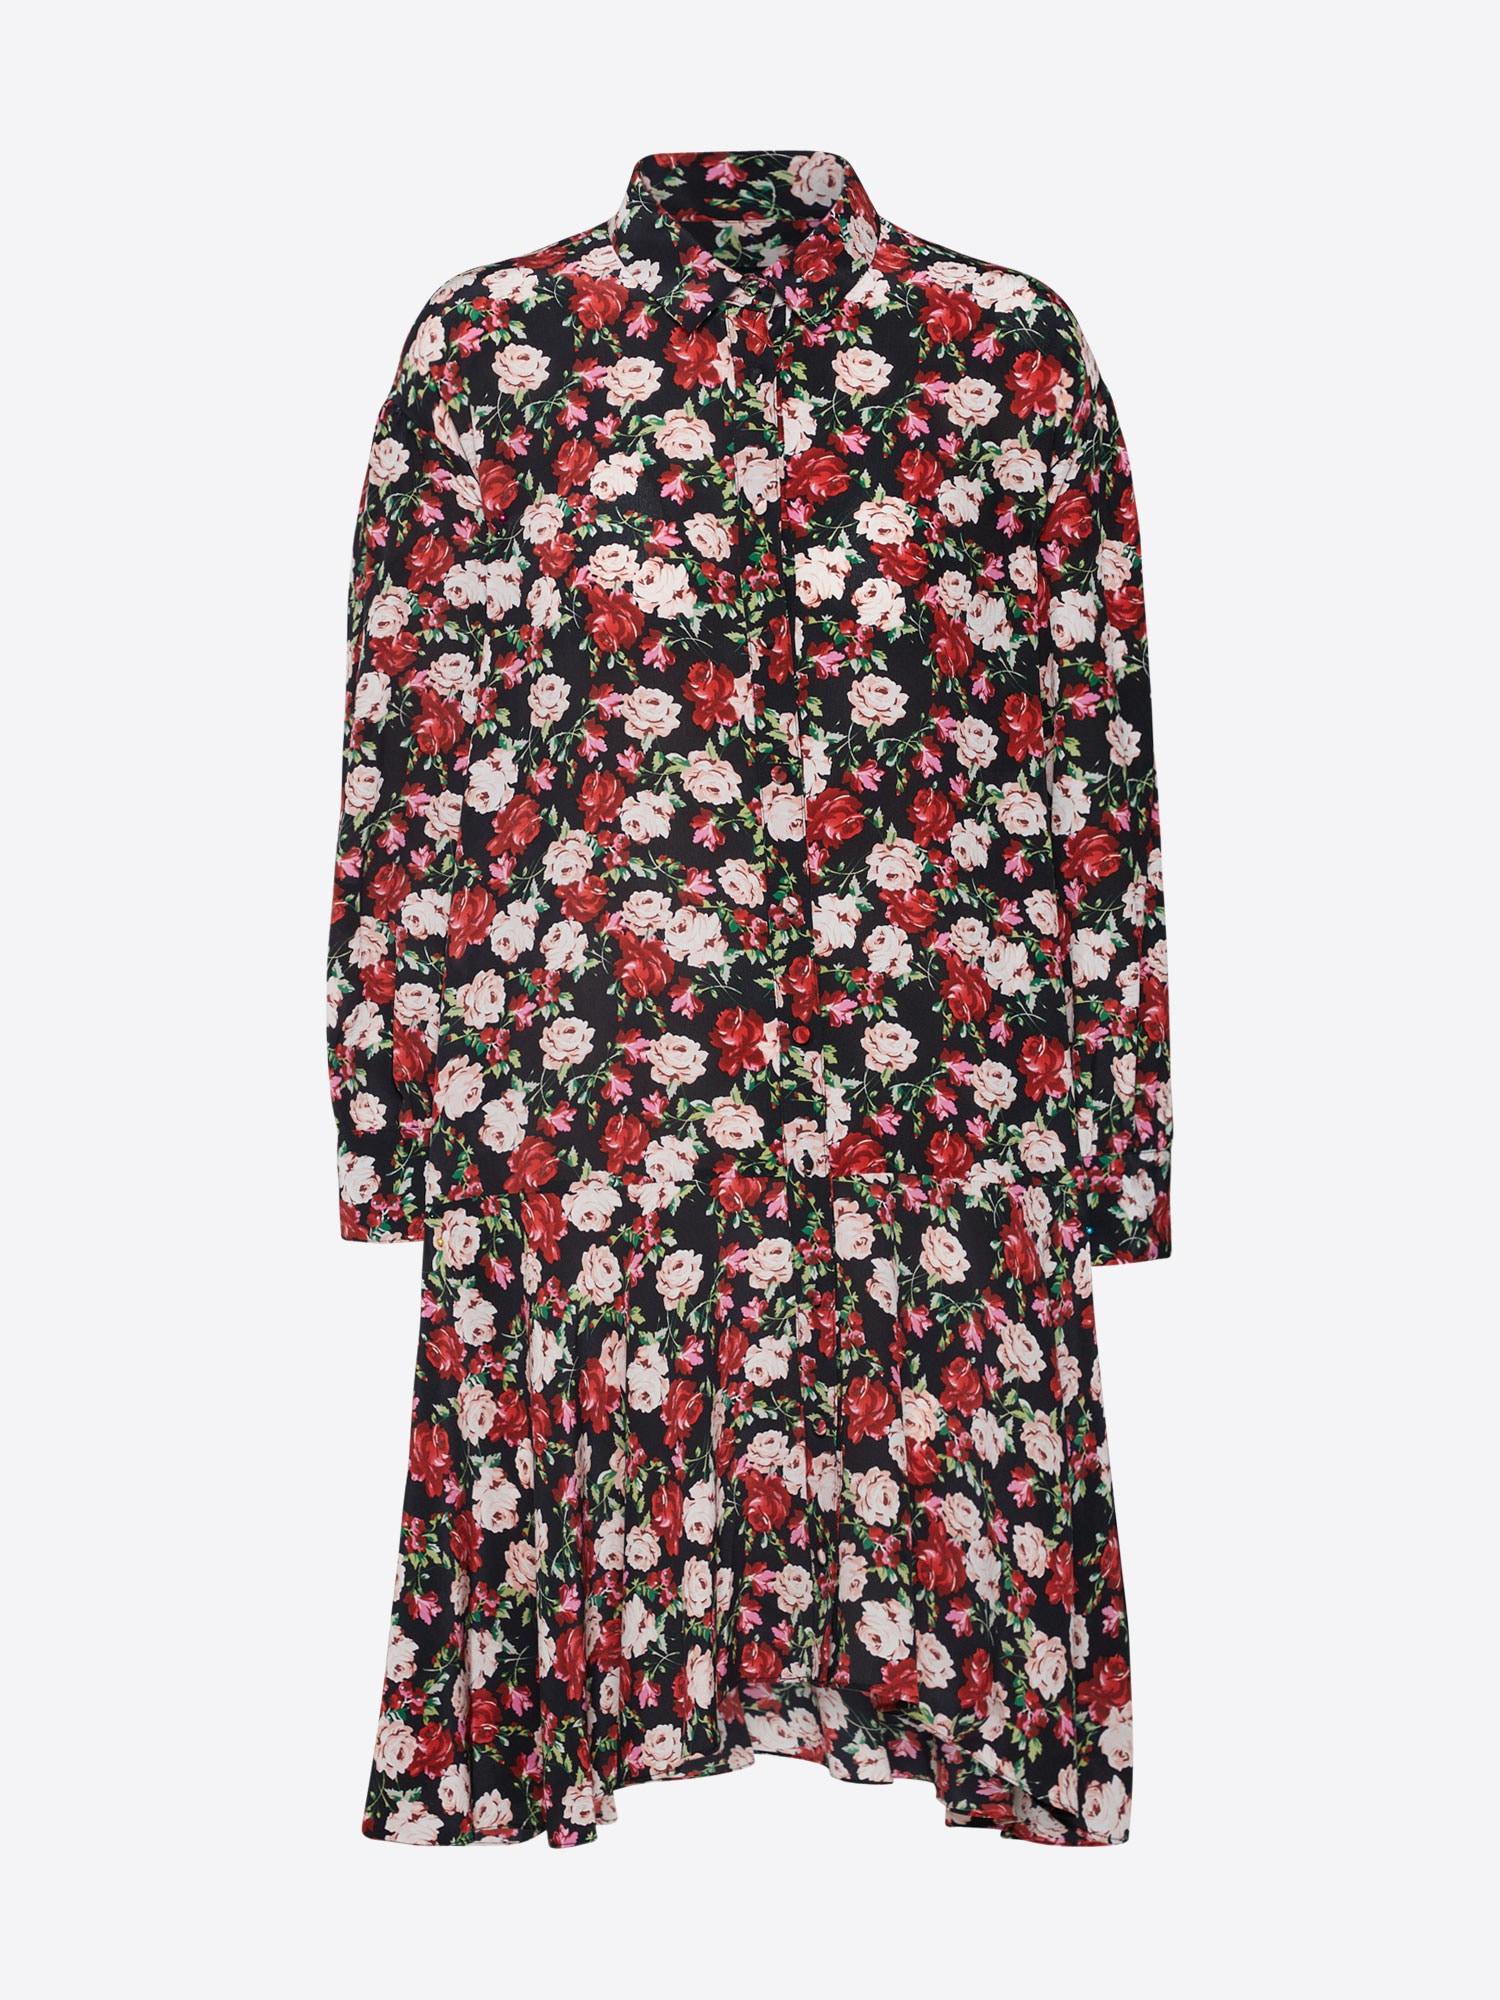 THE KOOPLES SPORT Kleid rot / schwarz - Schwarzes Kleid